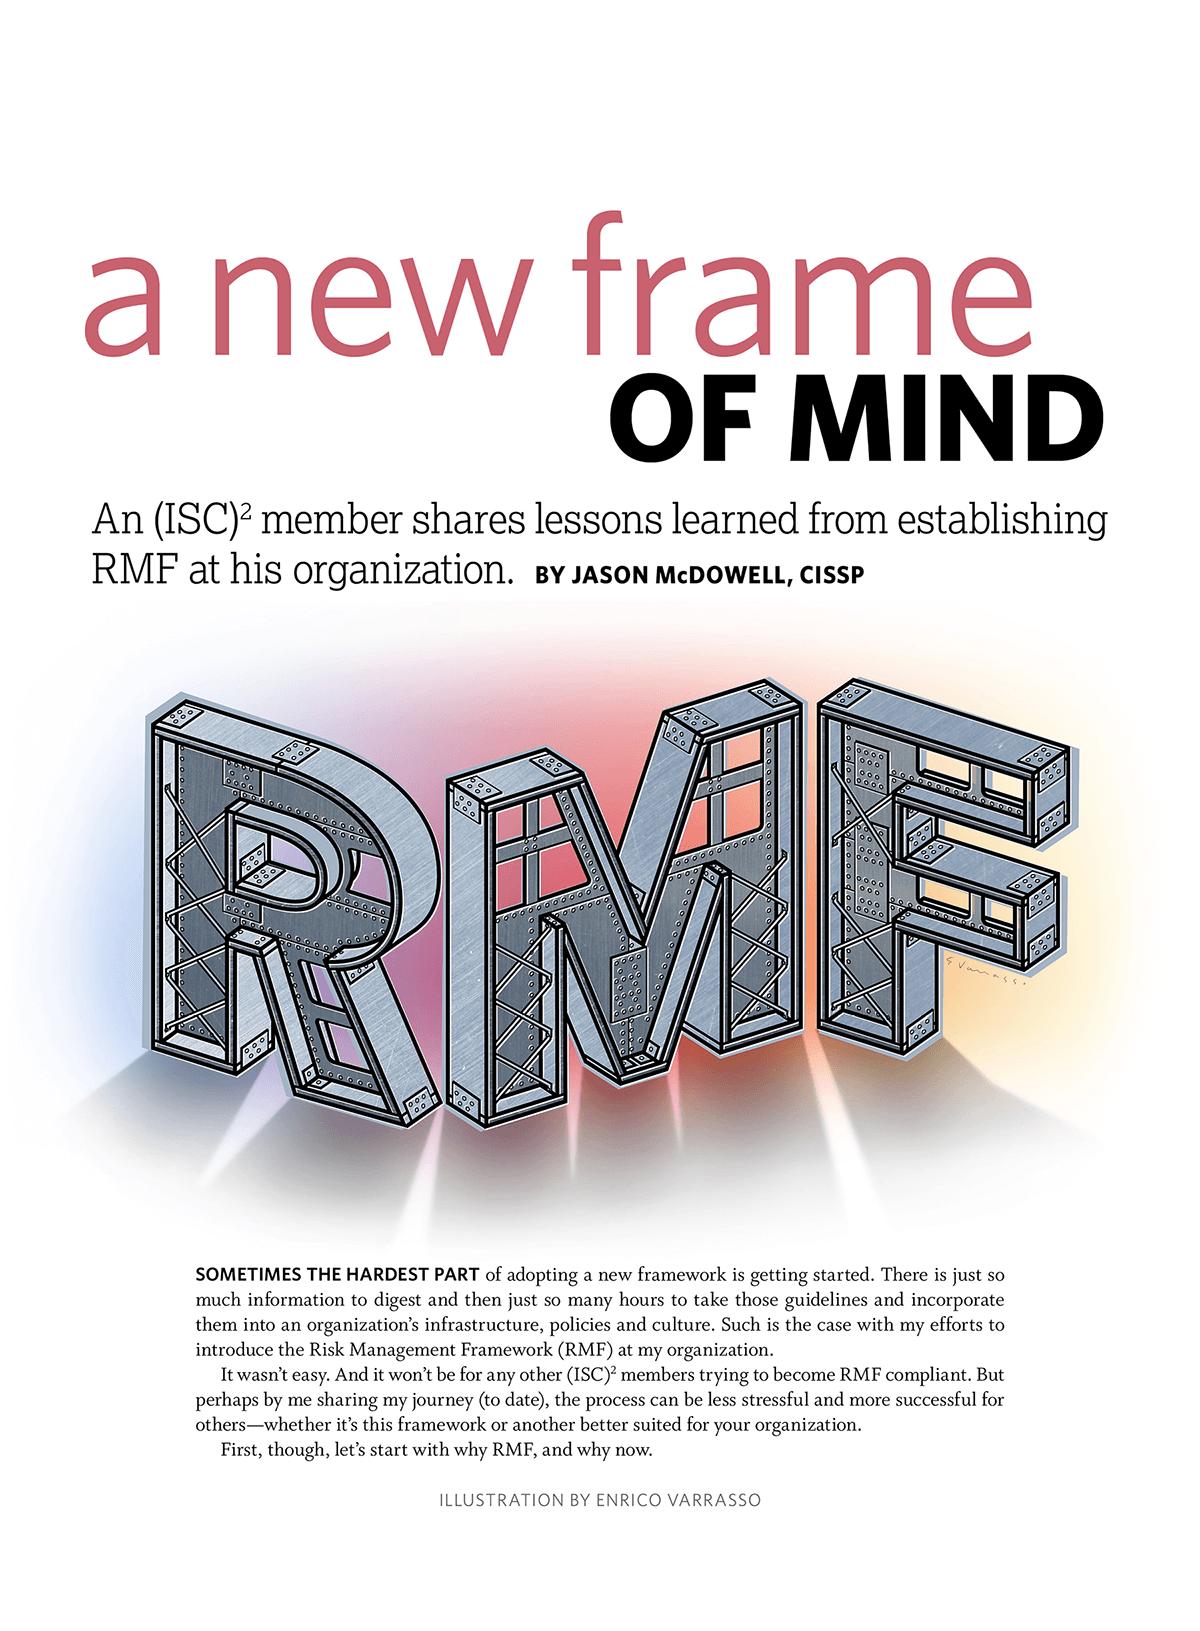 A new frame of mind